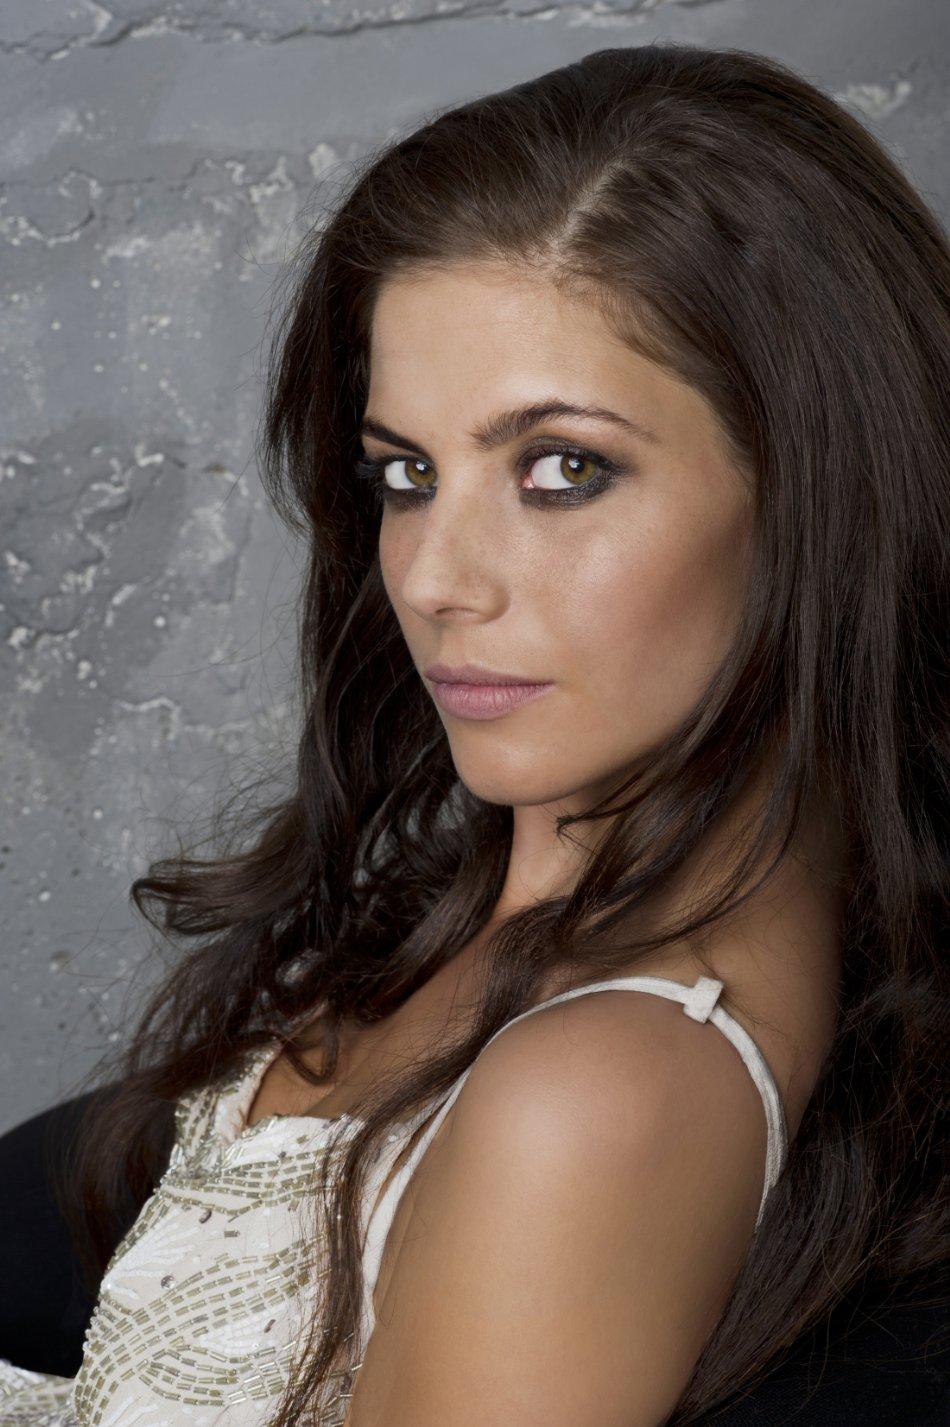 Top 10 hot Beautiful Polish Women Exclusive All Search